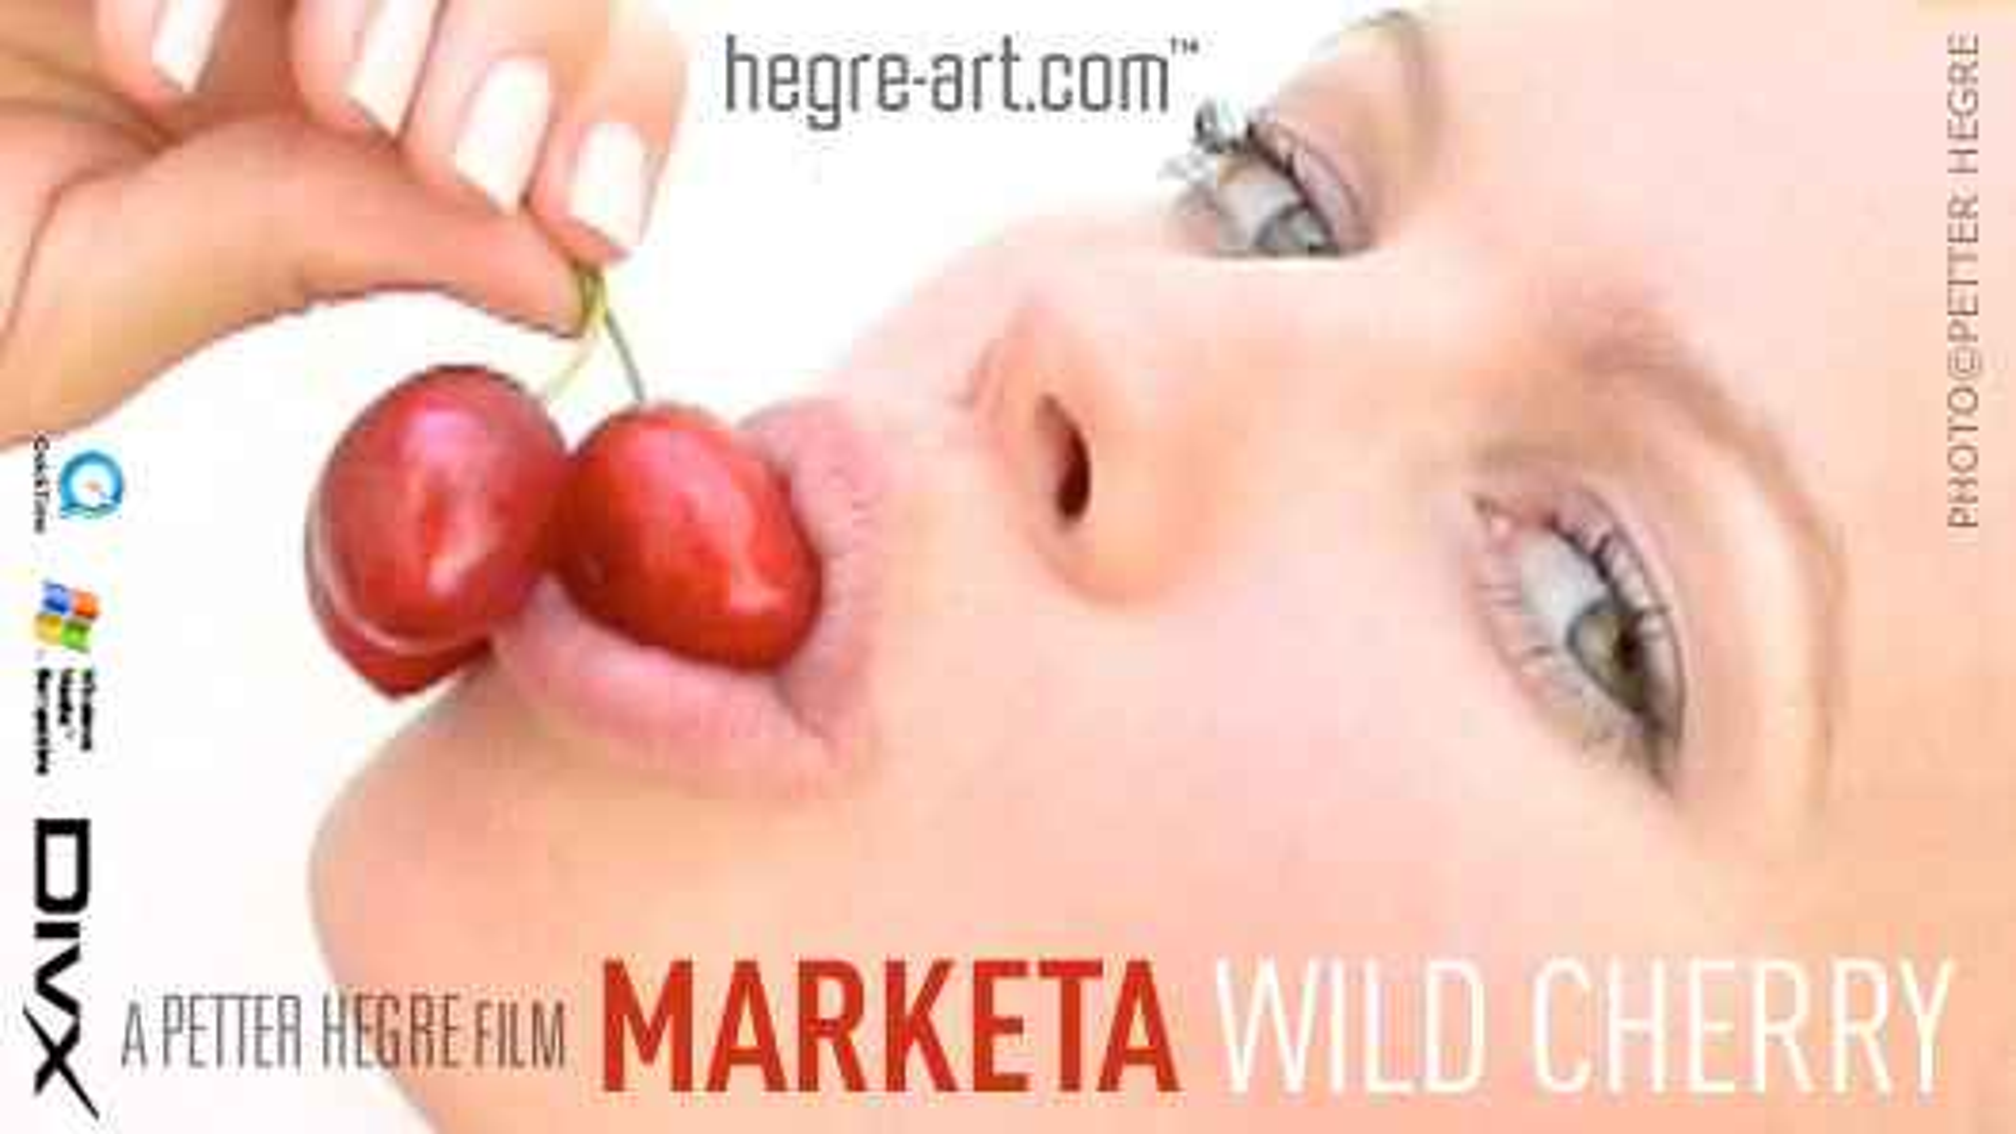 Marketa wild cherry